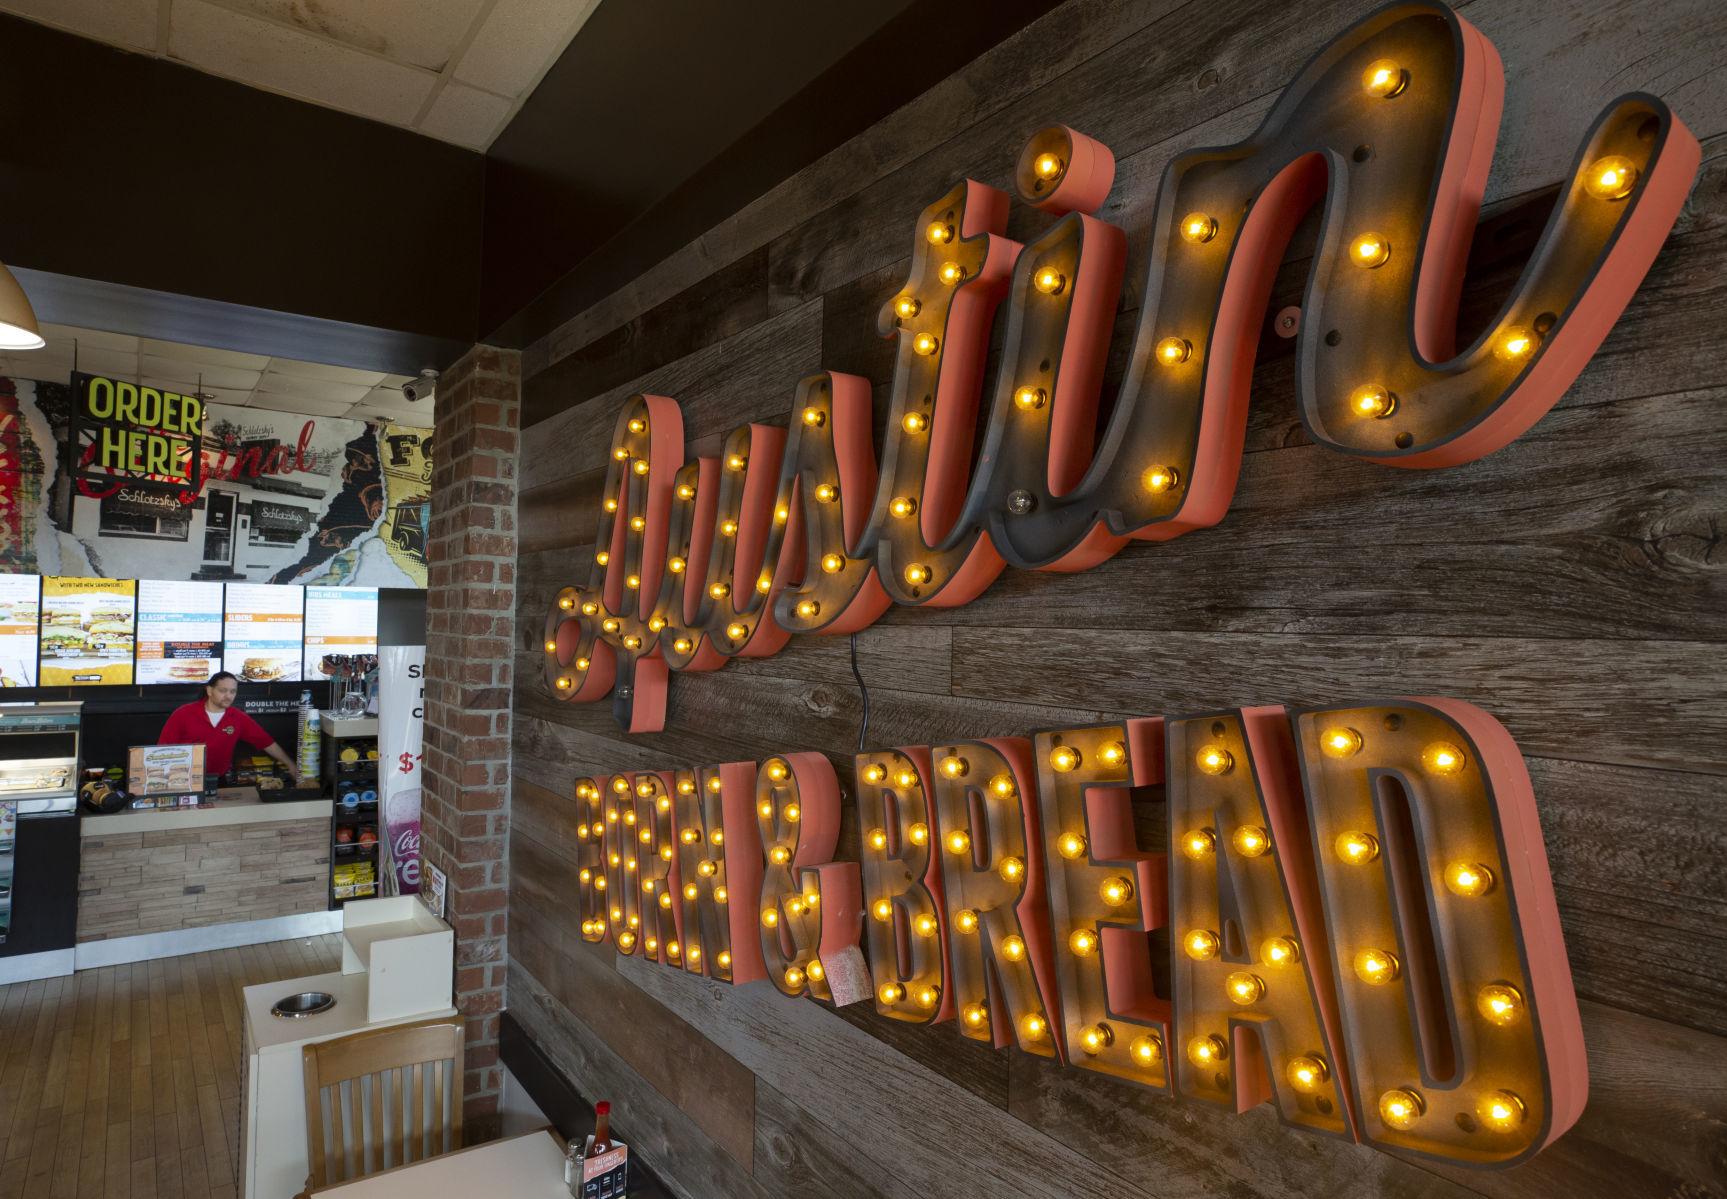 Shrimp 'N Stuff makes a move; Schlotzsky's returns to its Austin roots